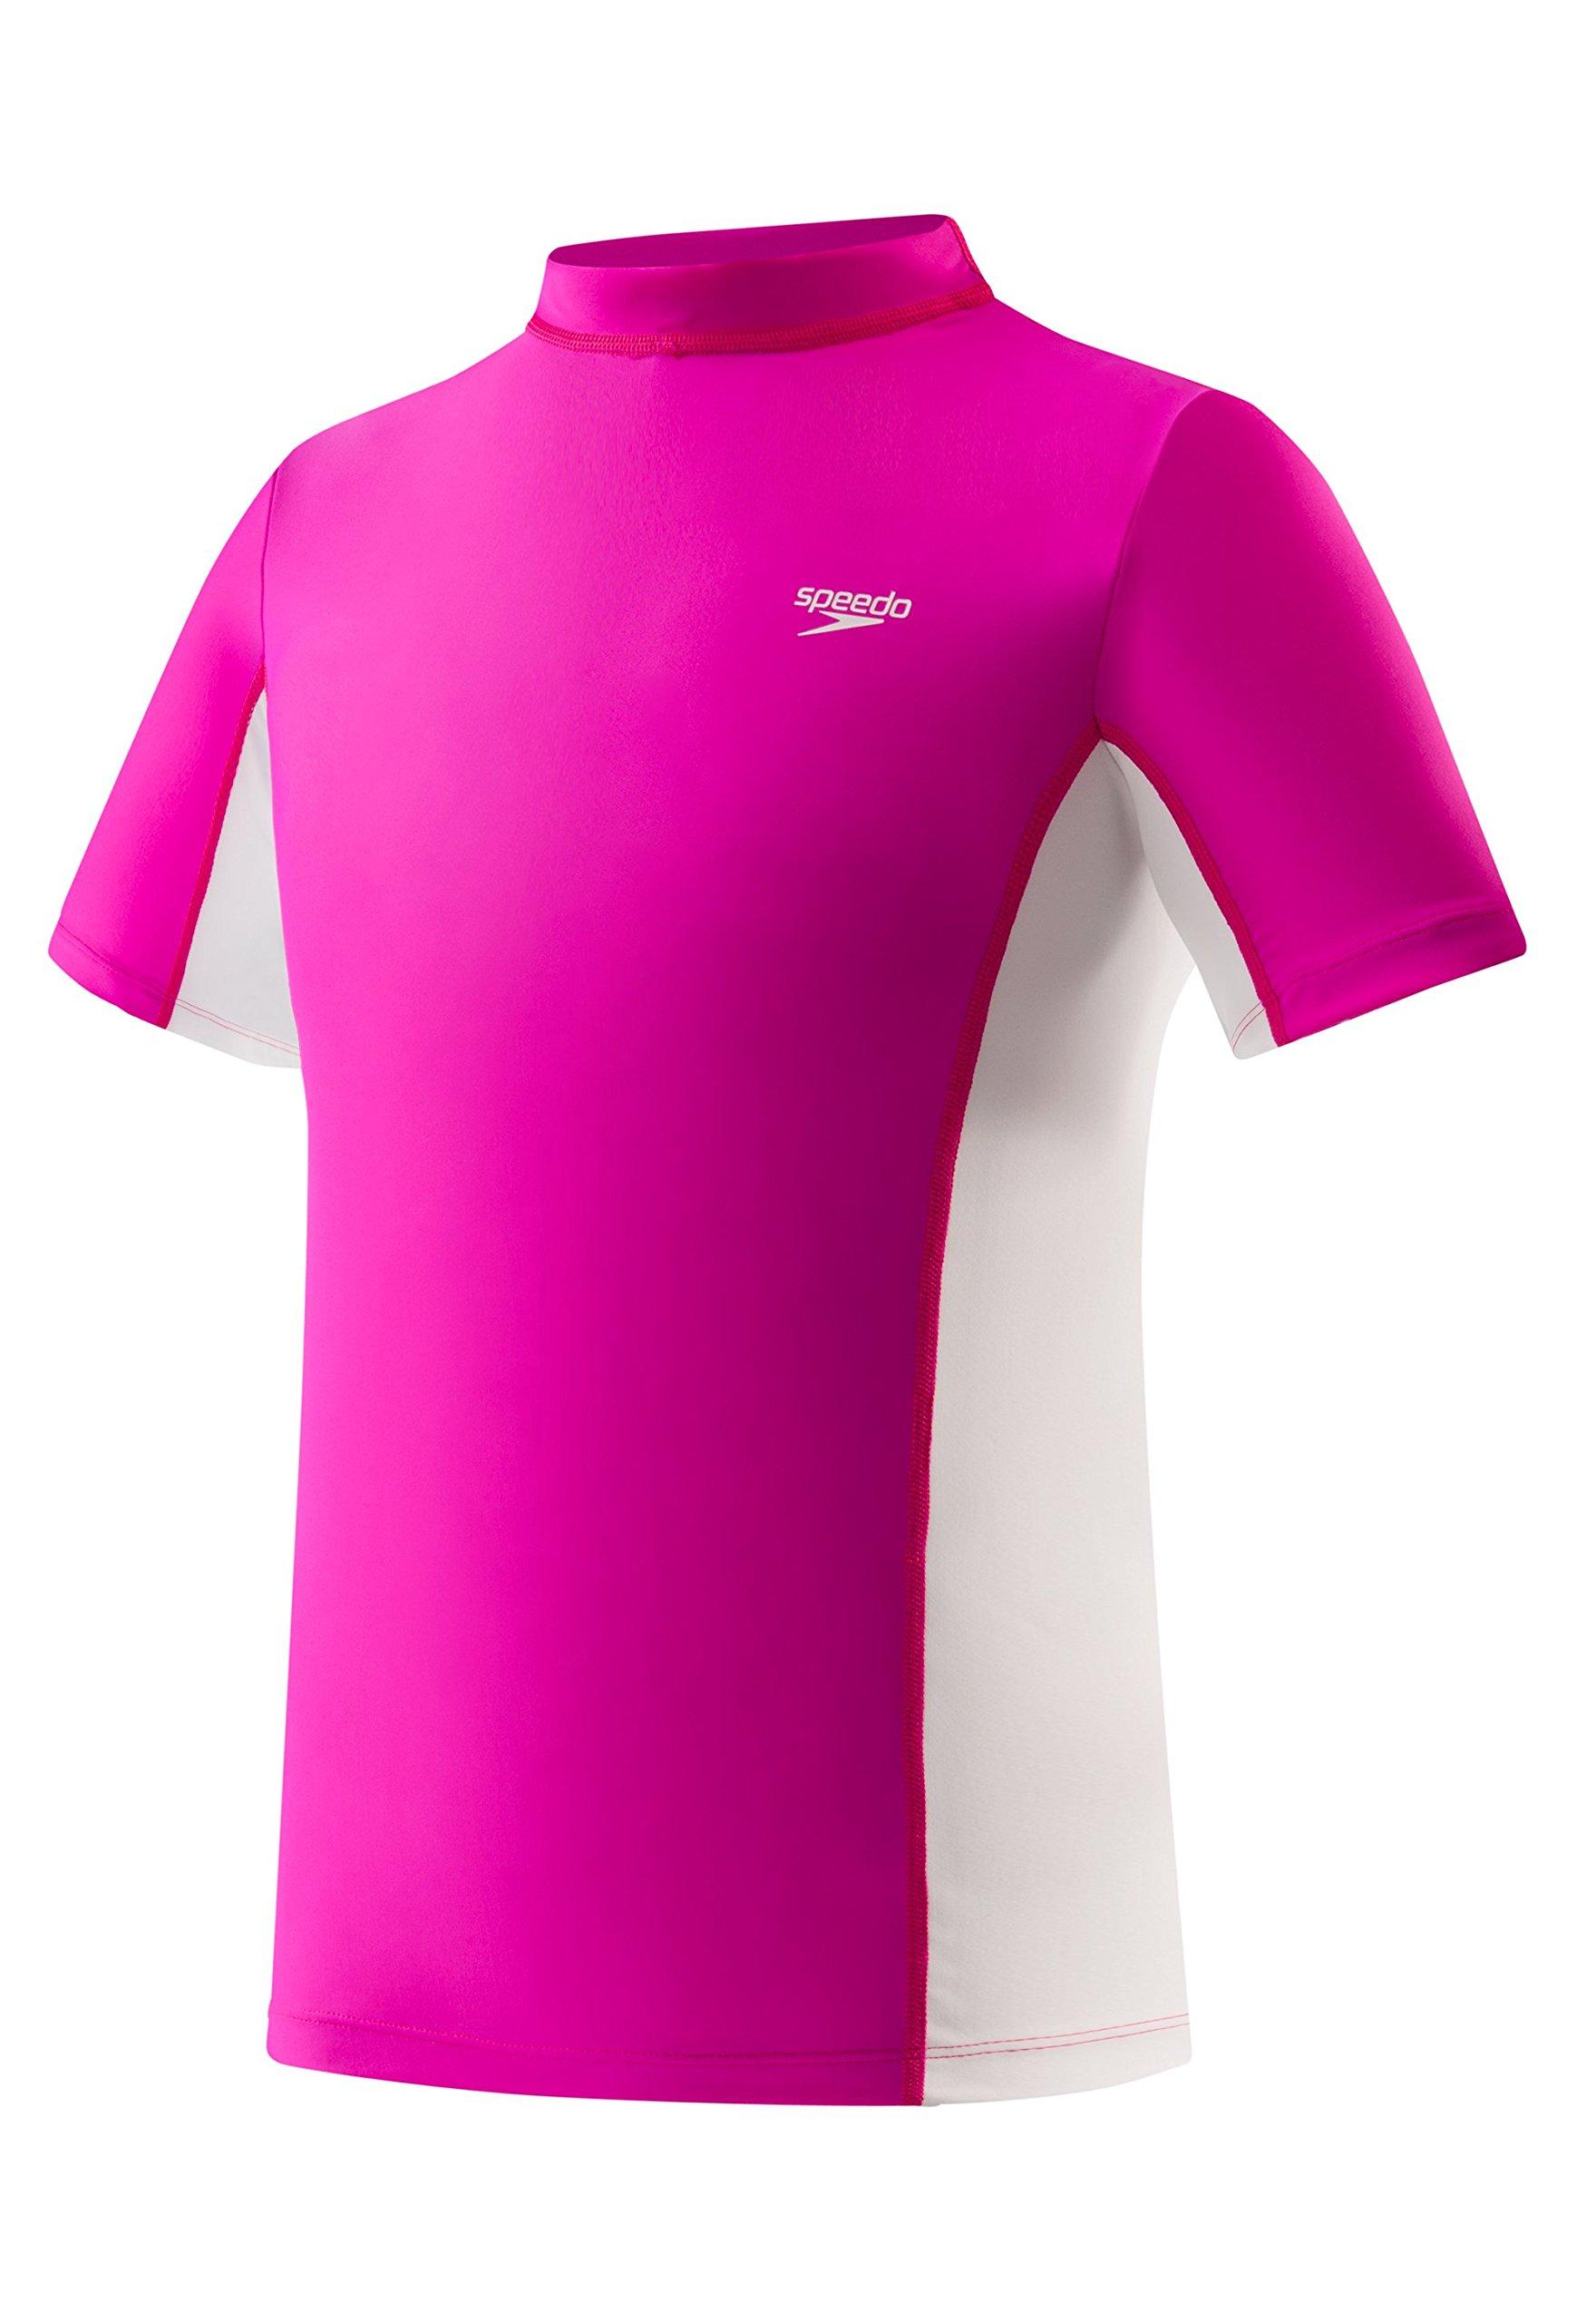 Speedo Big Girls' UV 50+ Short Sleeve Rashguard, New Blush, X-Large by Speedo